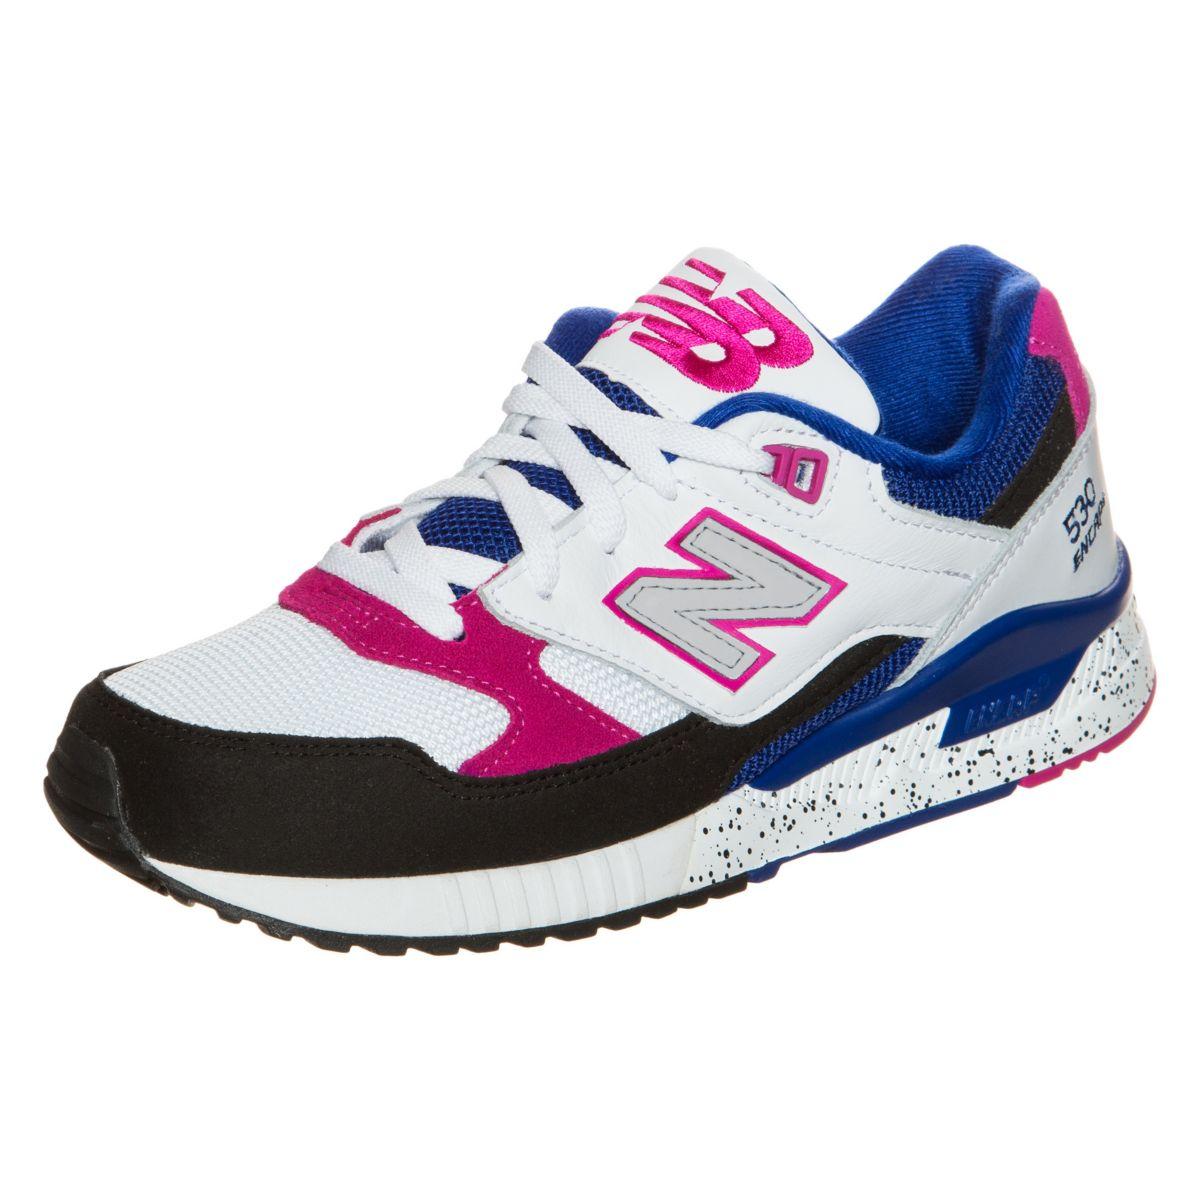 NEW BALANCE W530-PSA-B Sneaker Damen